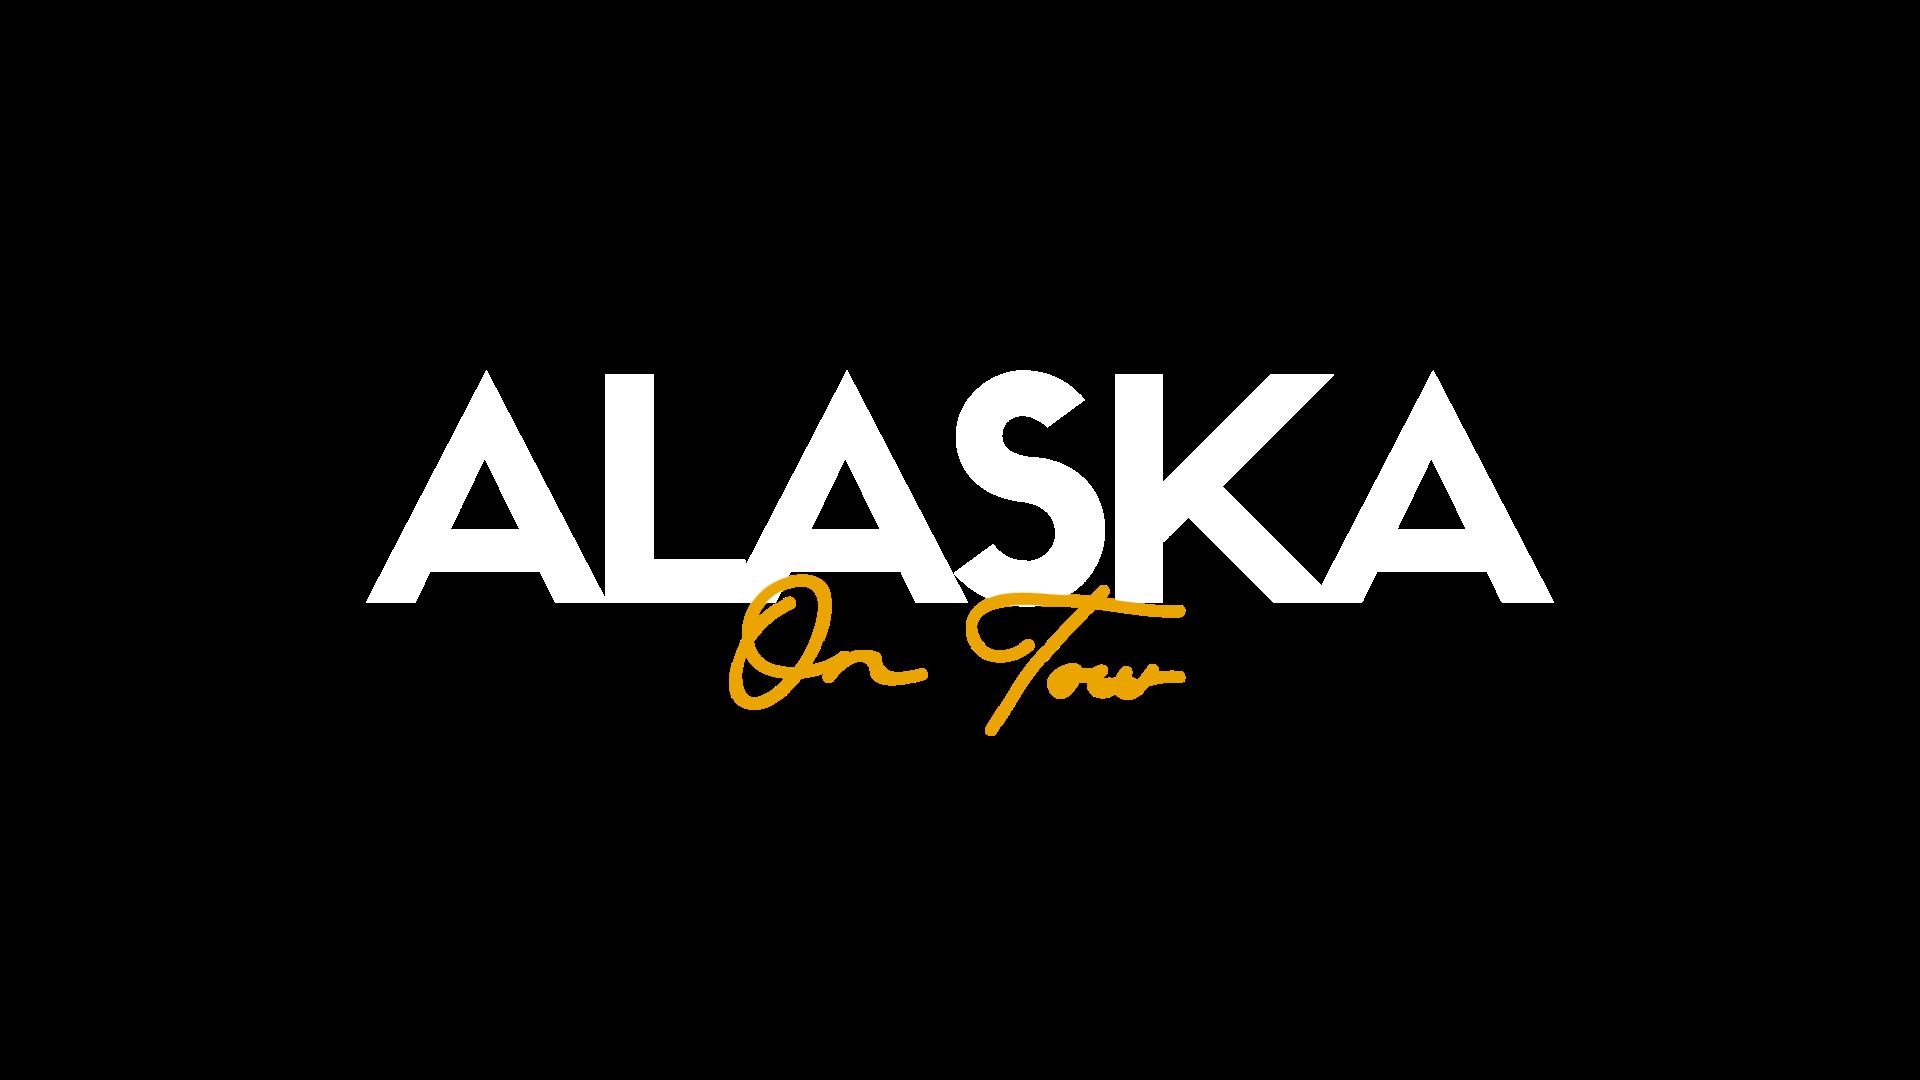 ALASKA ON TOUR